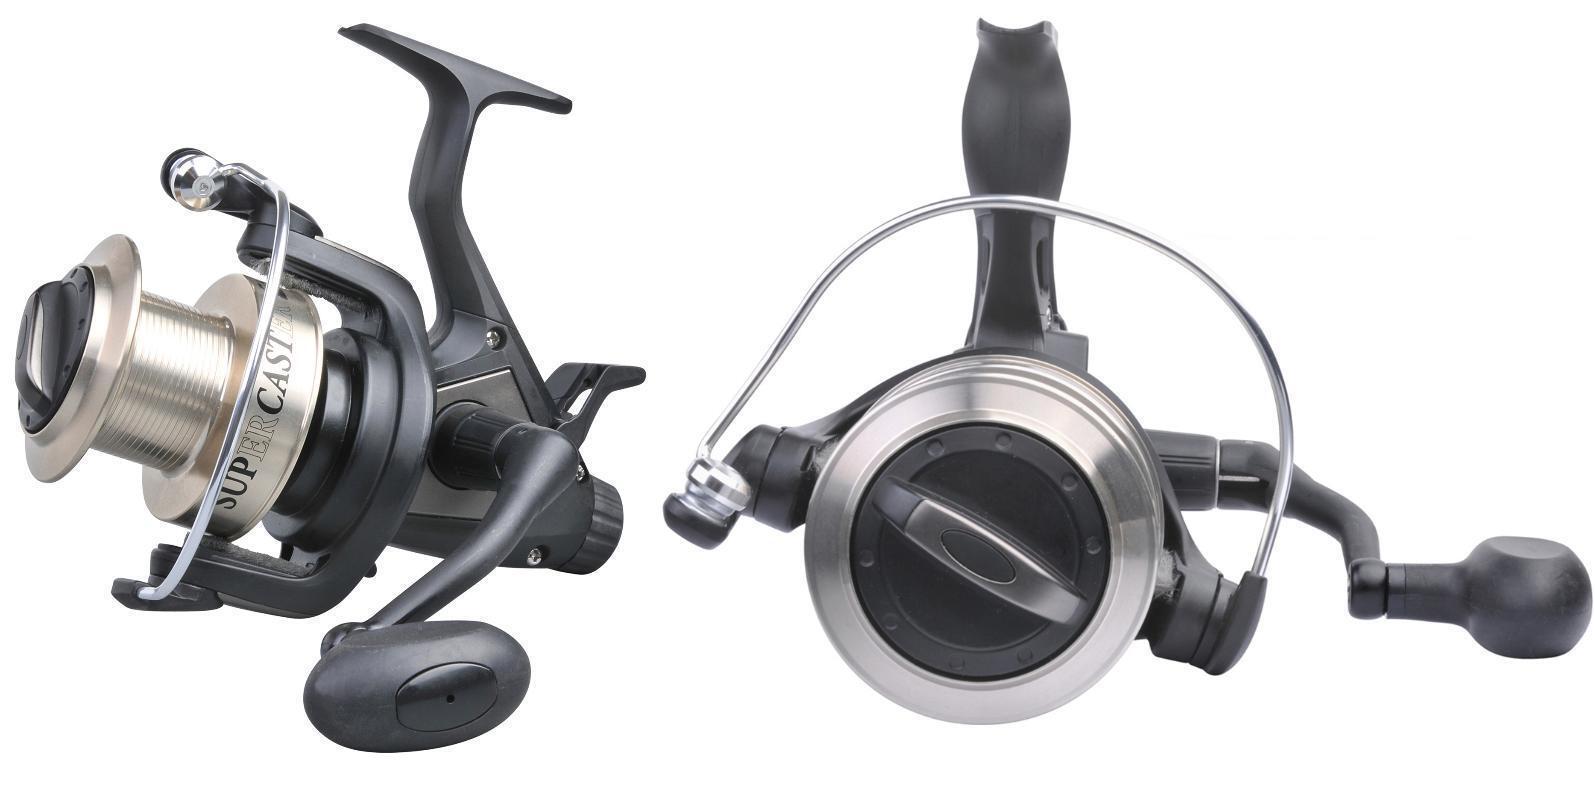 SPRO  Super Caster 560 LCS Carp Reel Reel Fishing Reel Reel Stationary role  outlet online store